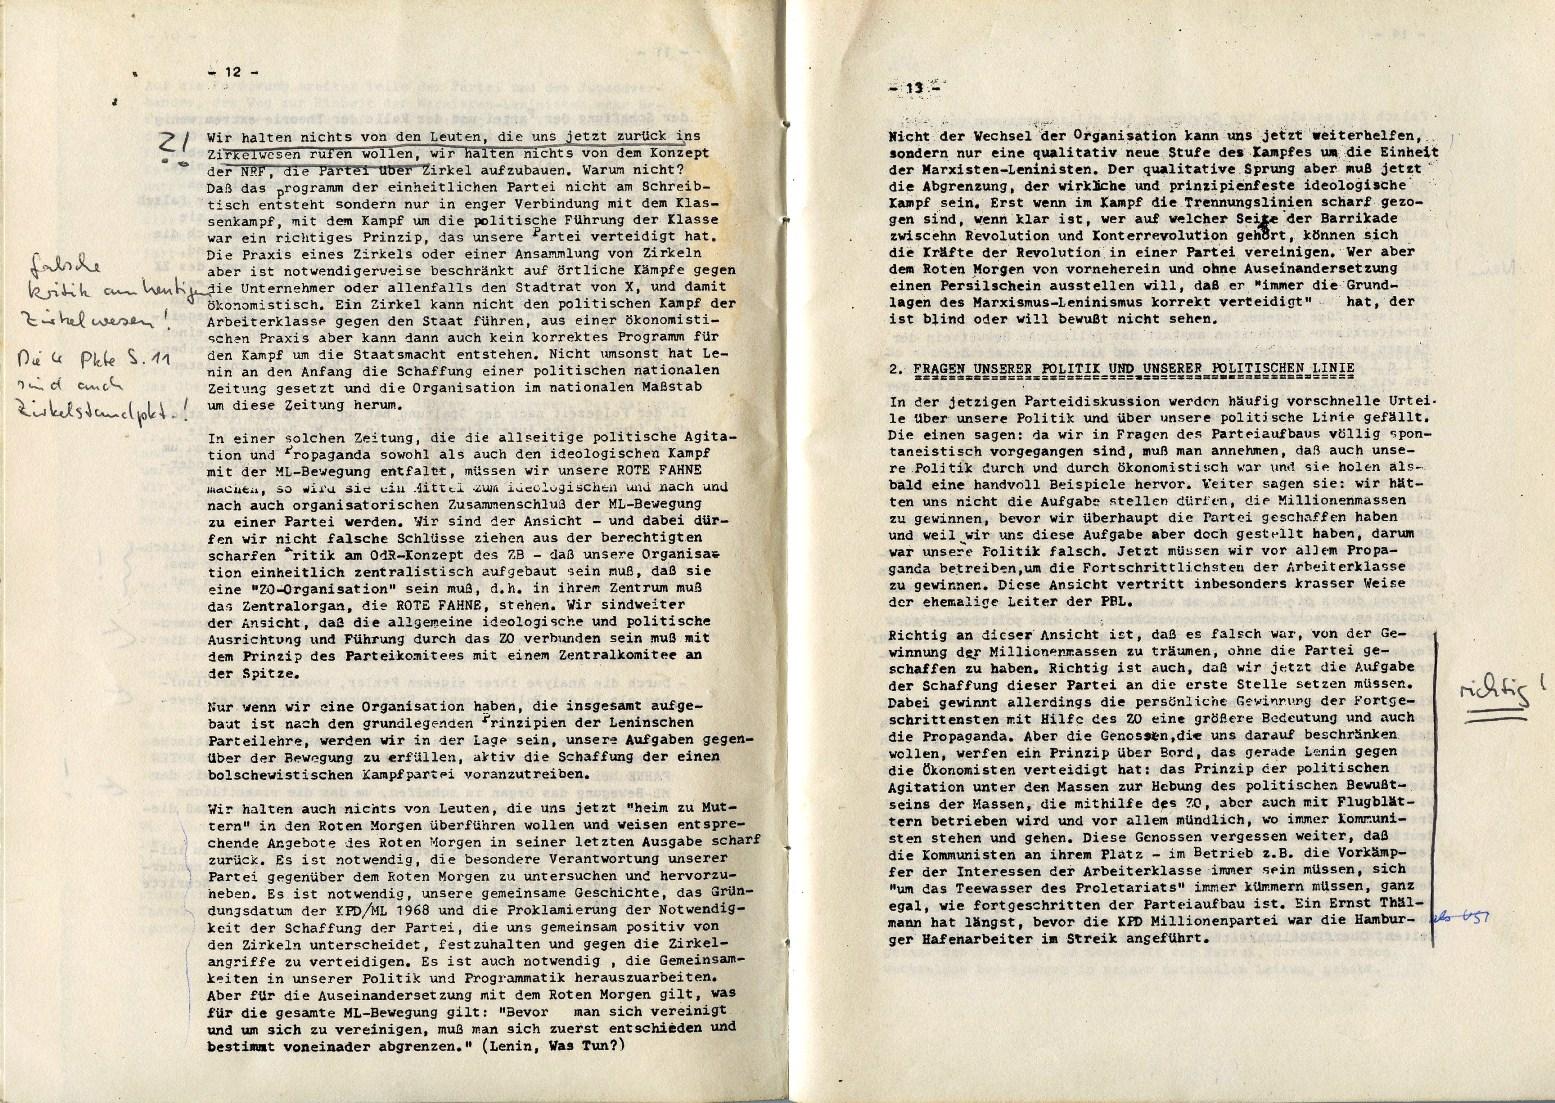 ZB_Universitas_1972_10